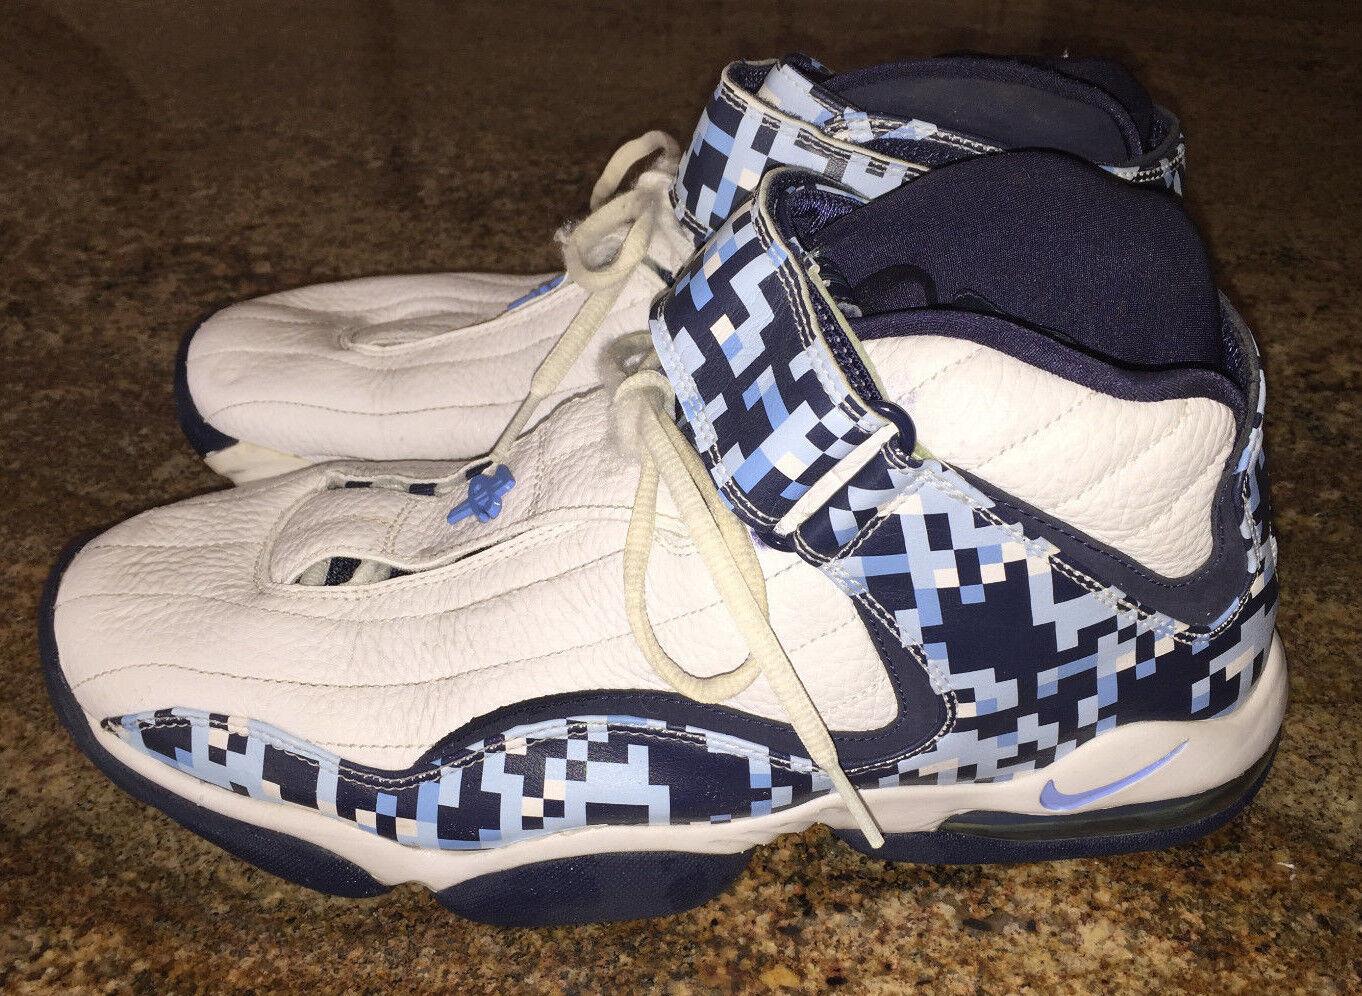 Jordan brand classic 2012 nuovi uomini 484654-400 484654-400 uomini pe university blue sz 10 zio 23ed6b